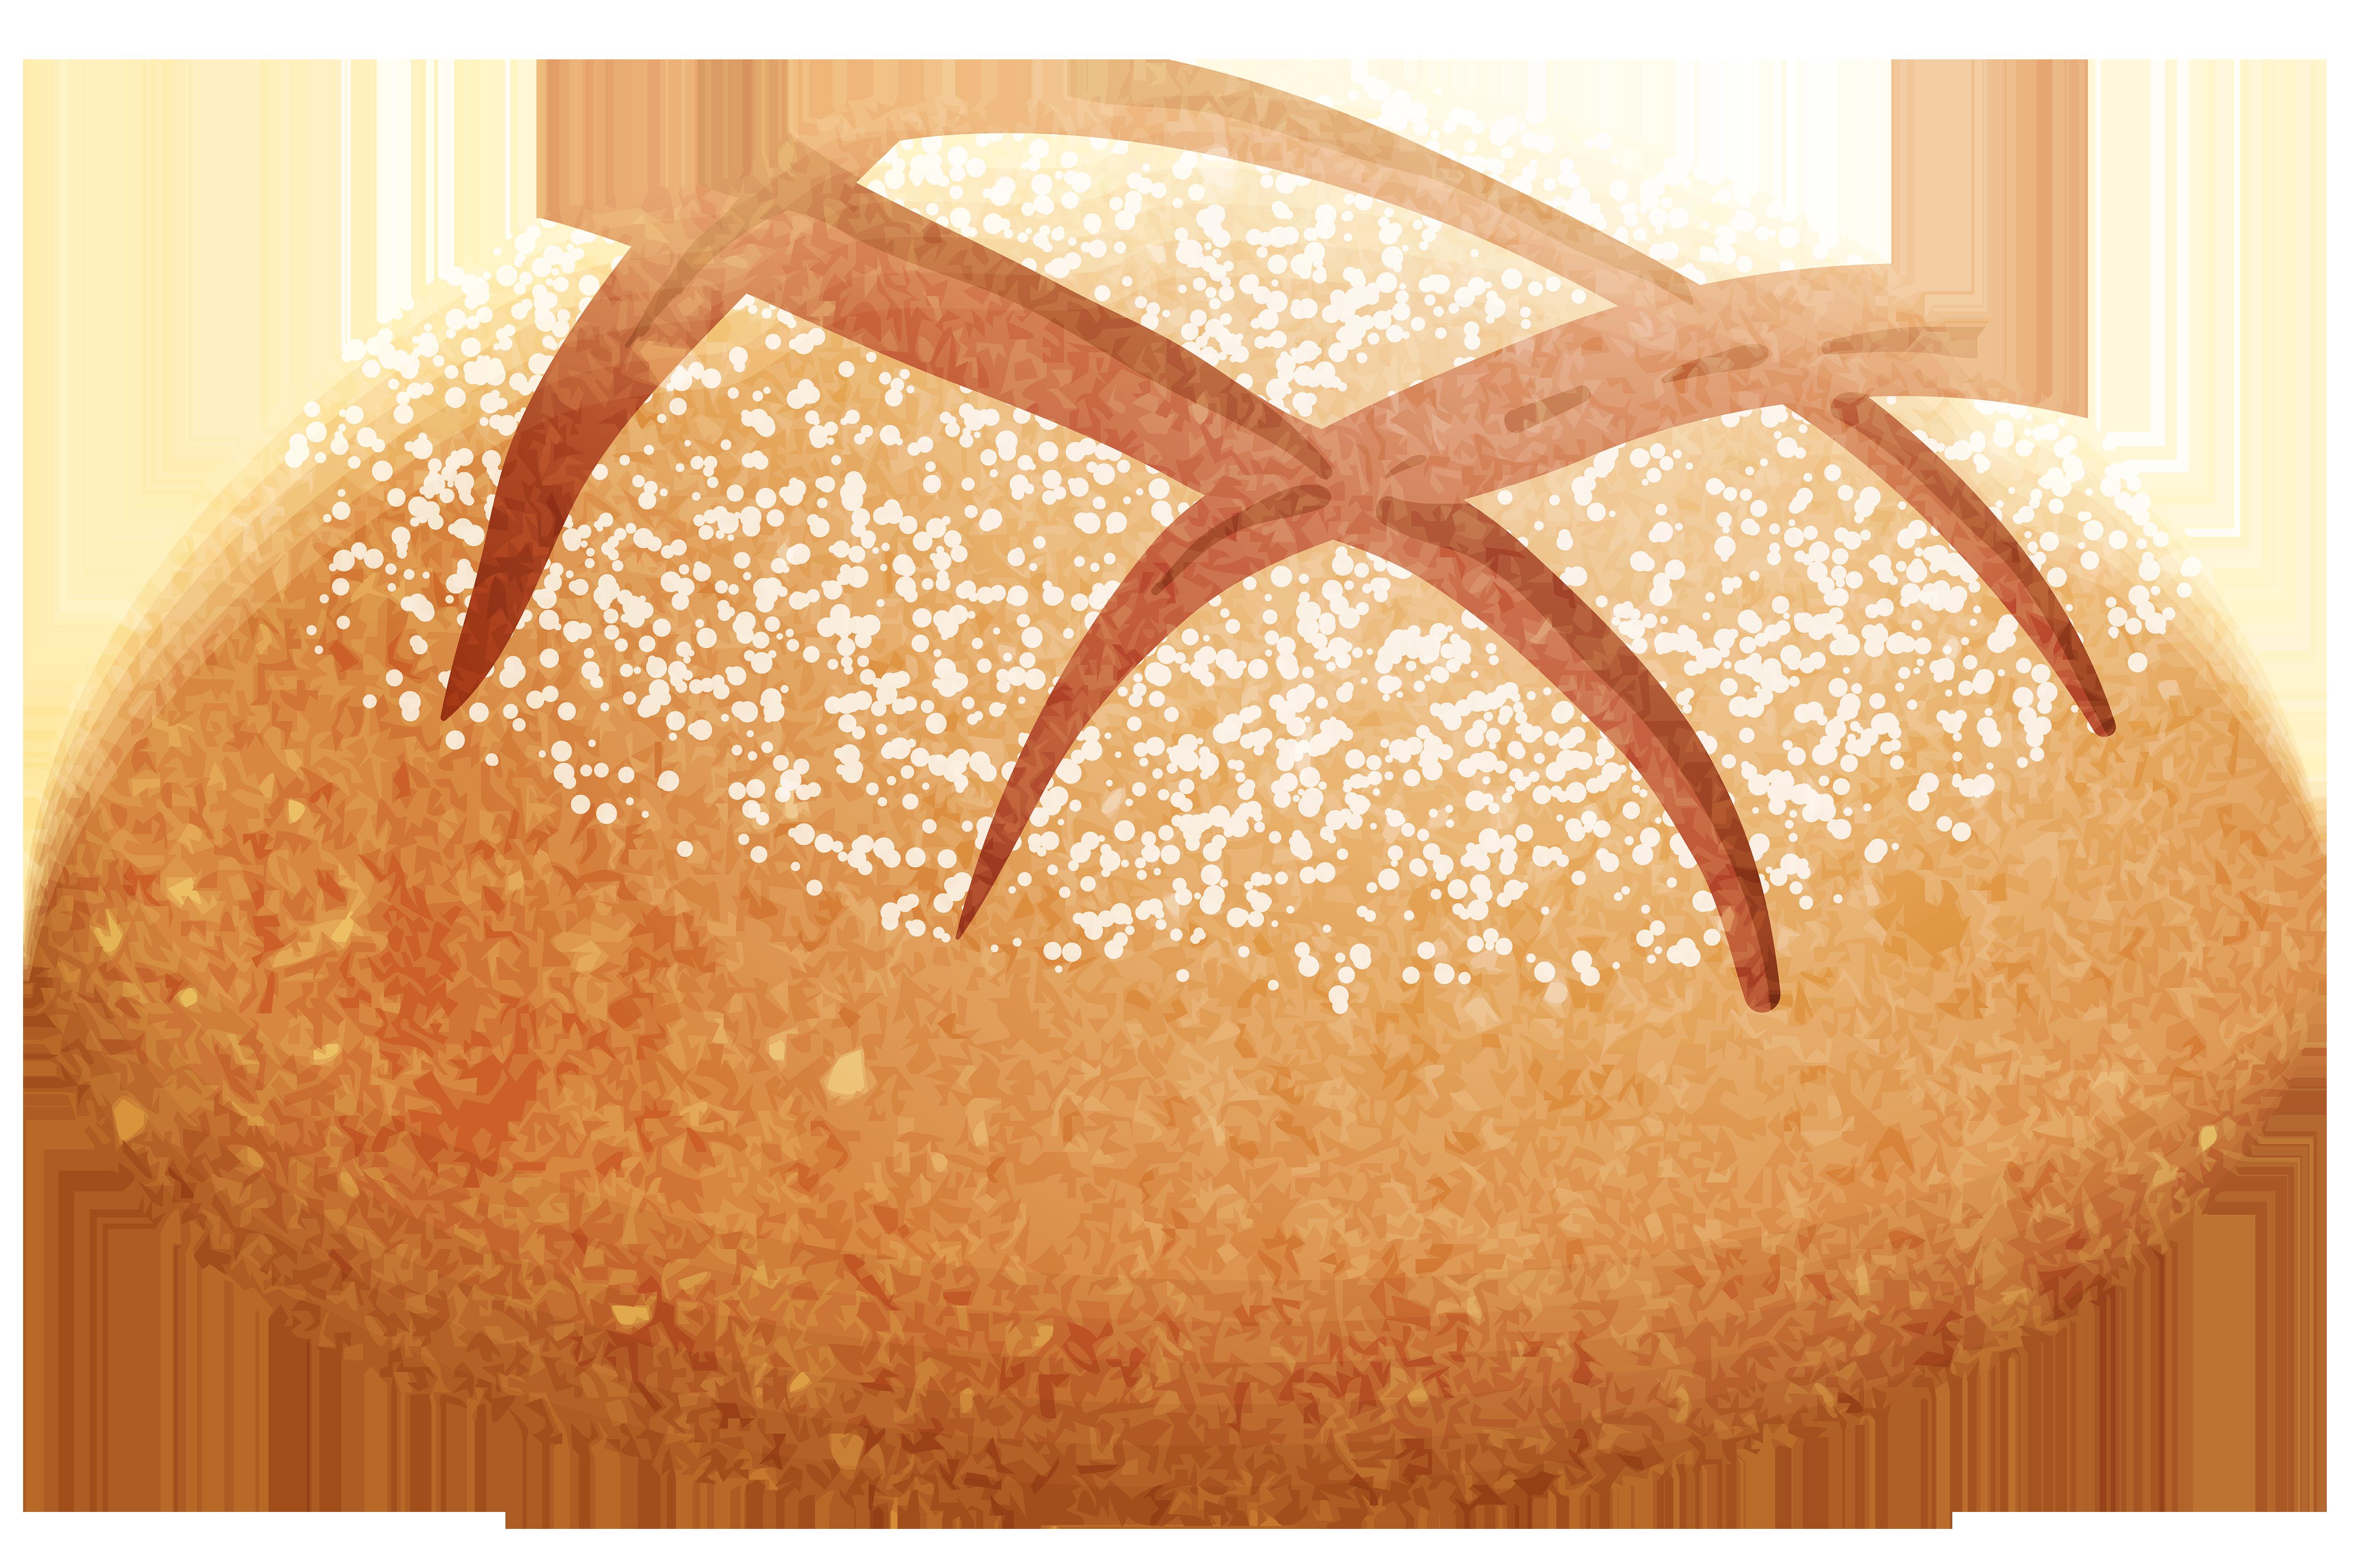 Clipart bread. Artisan png clip art